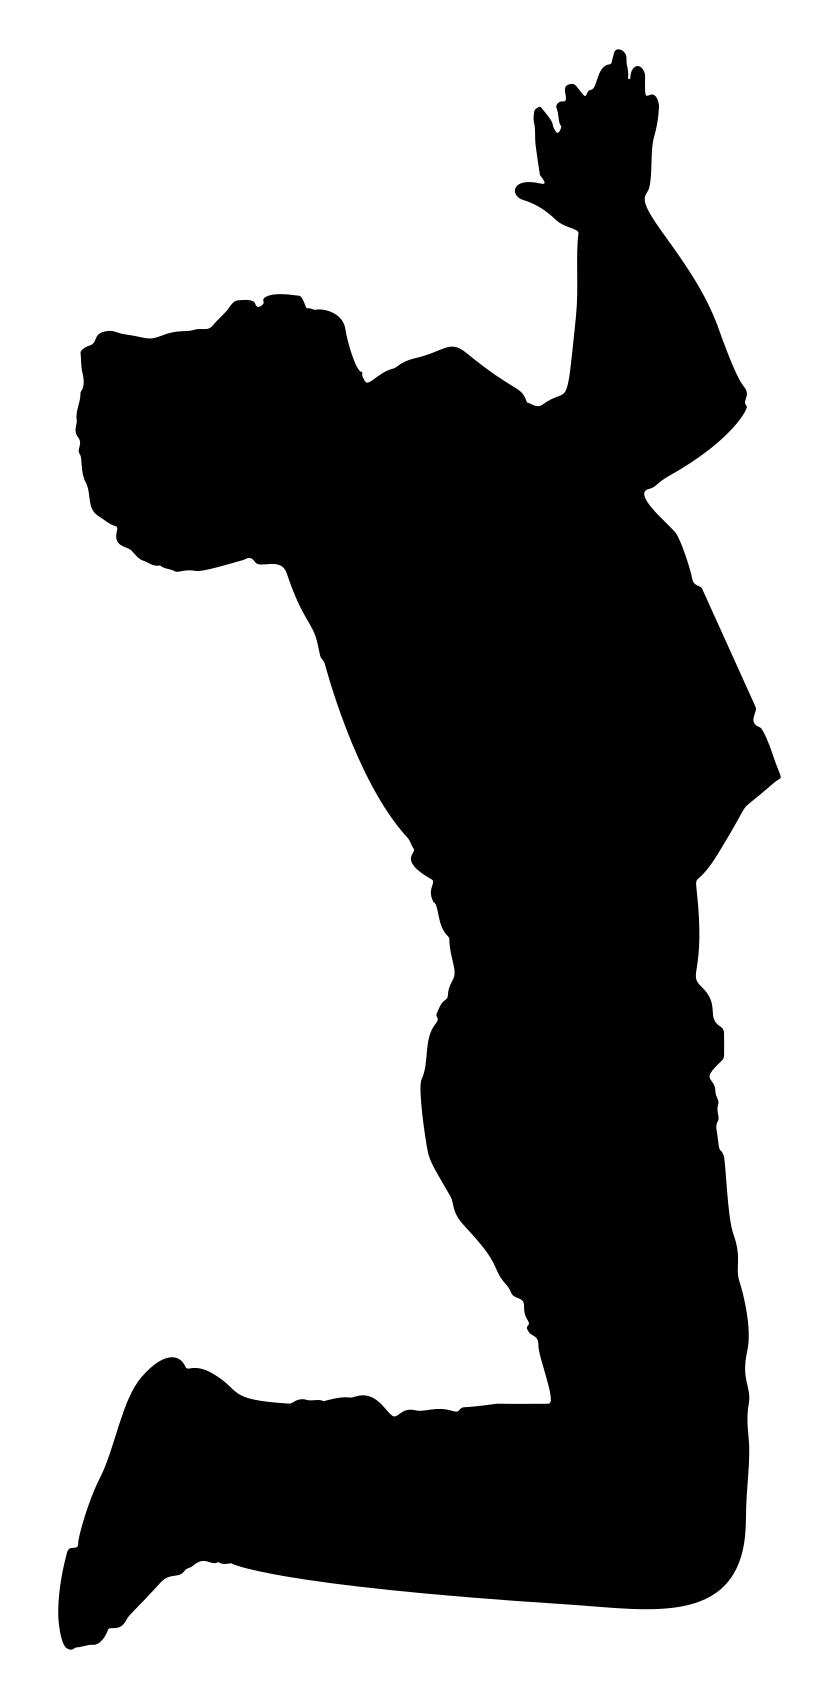 839x1699 Praying Man Silhouette Clipart